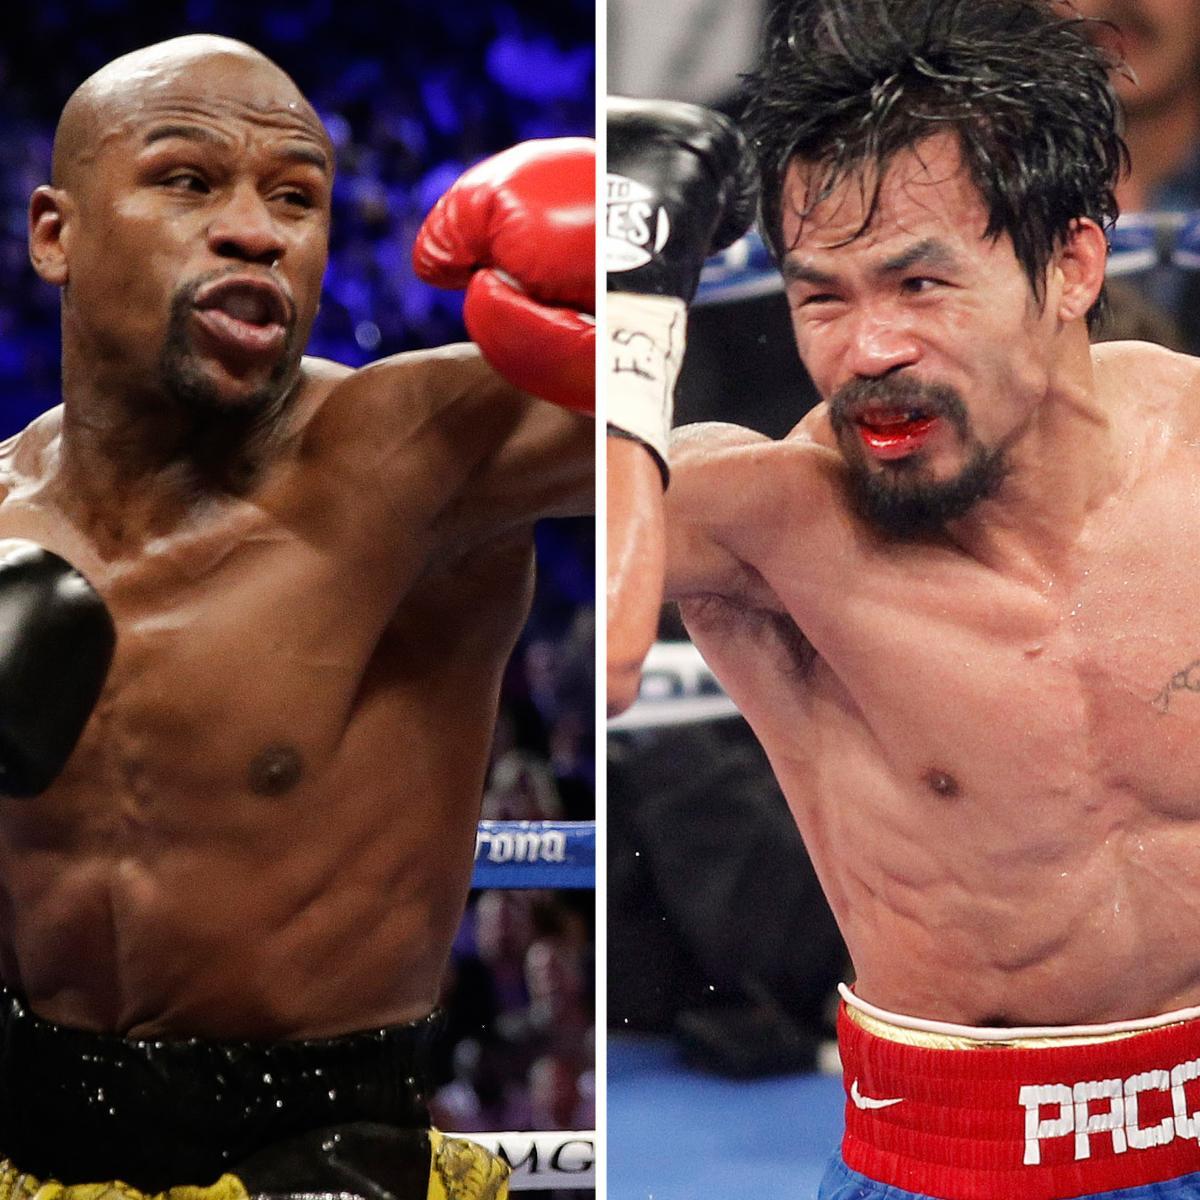 Floyd Mayweather Jr. Vs. Manny Pacquiao Boxing Betting